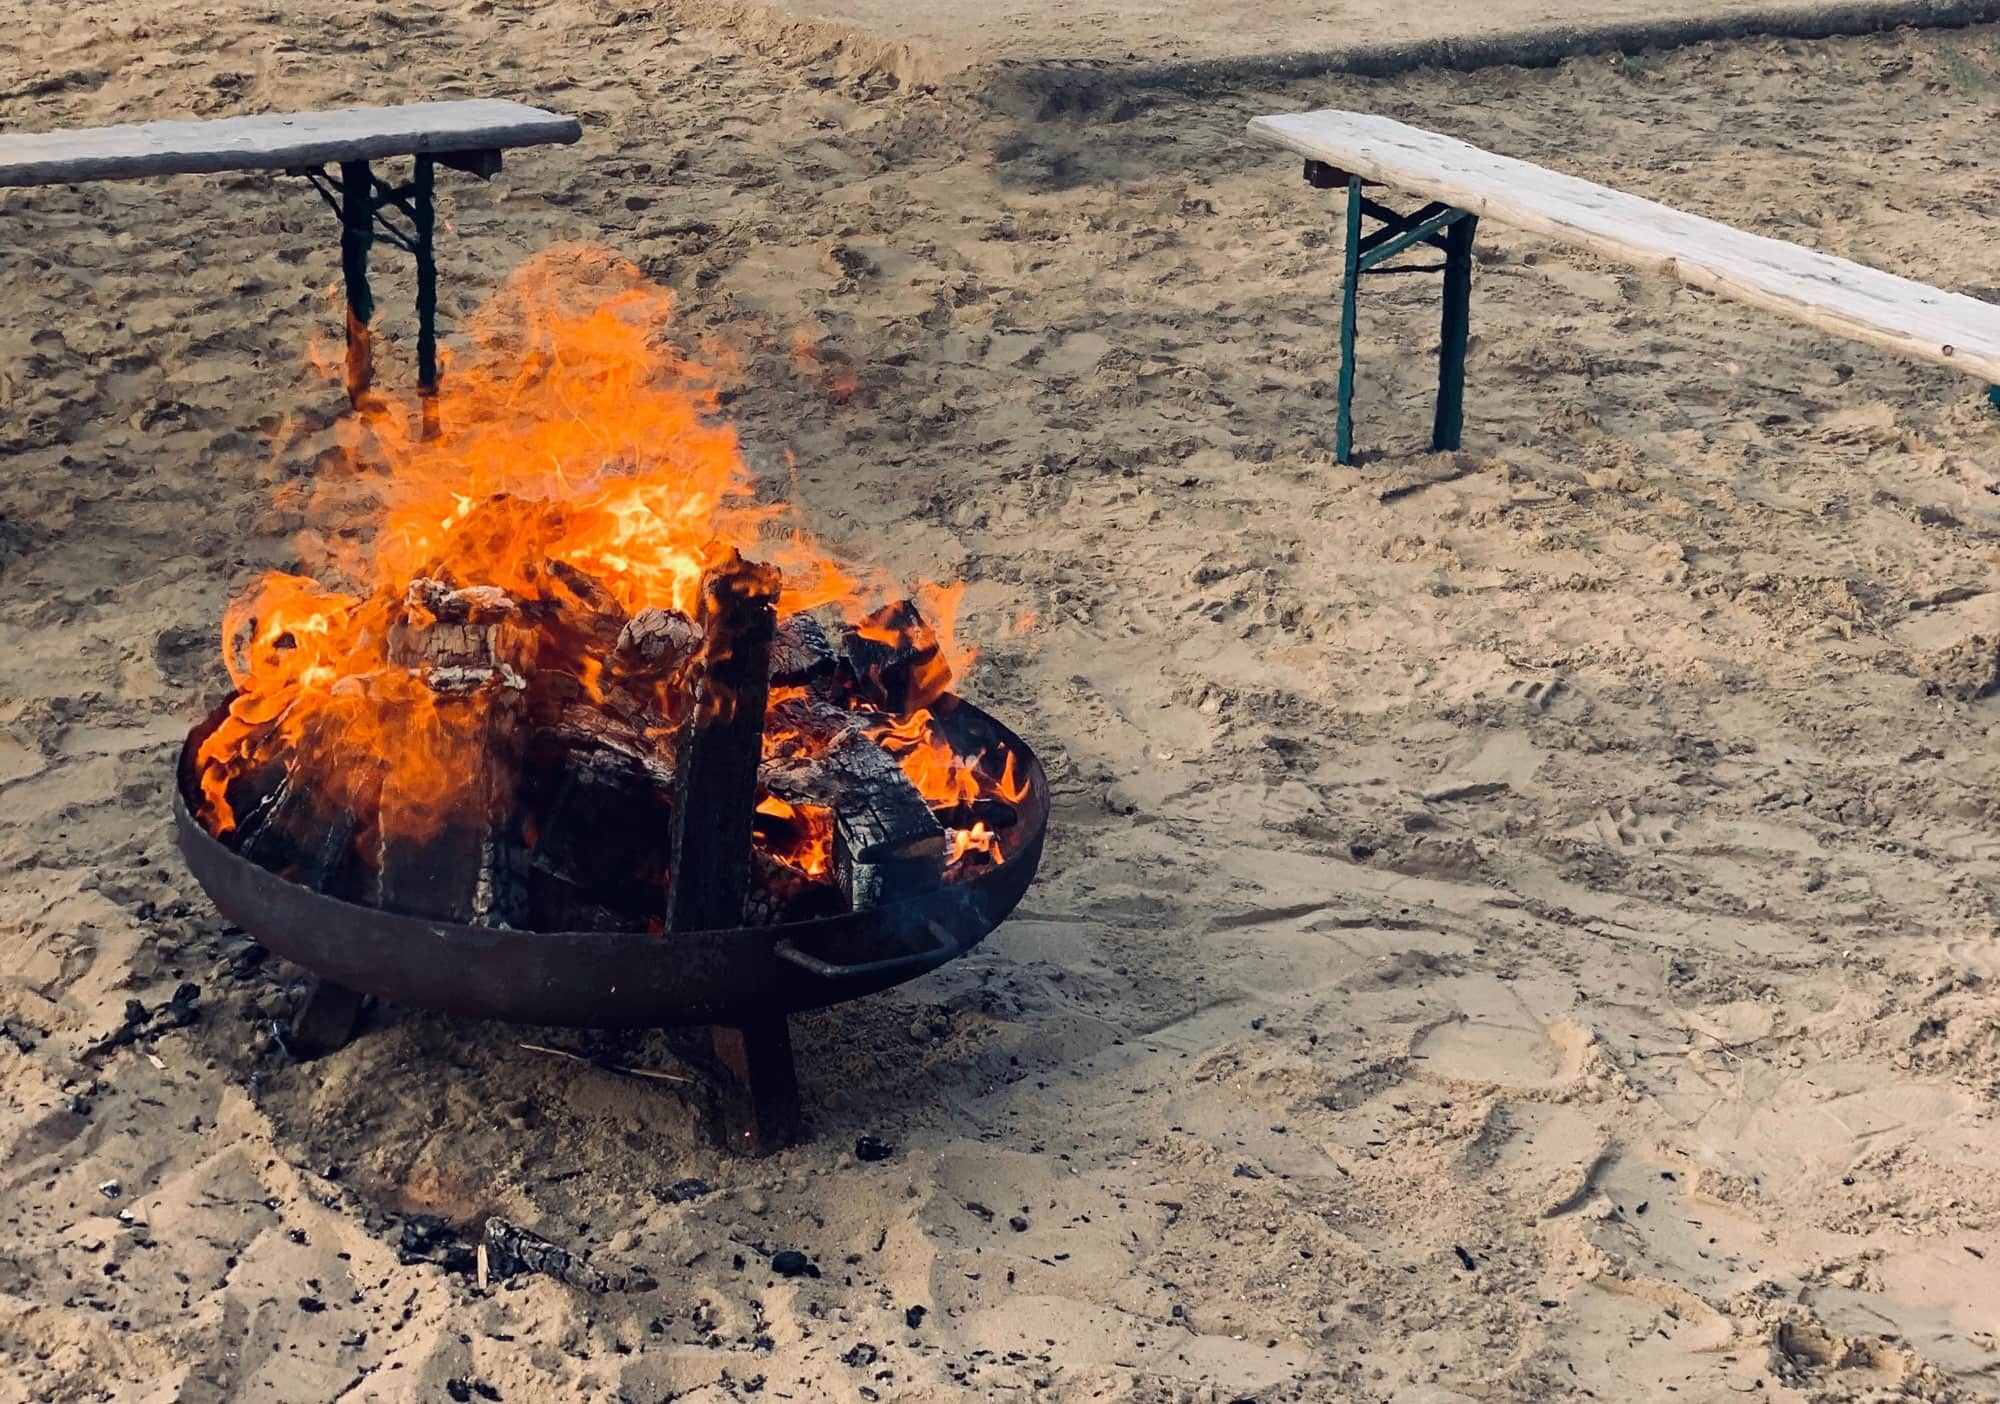 Some illustrative fire.